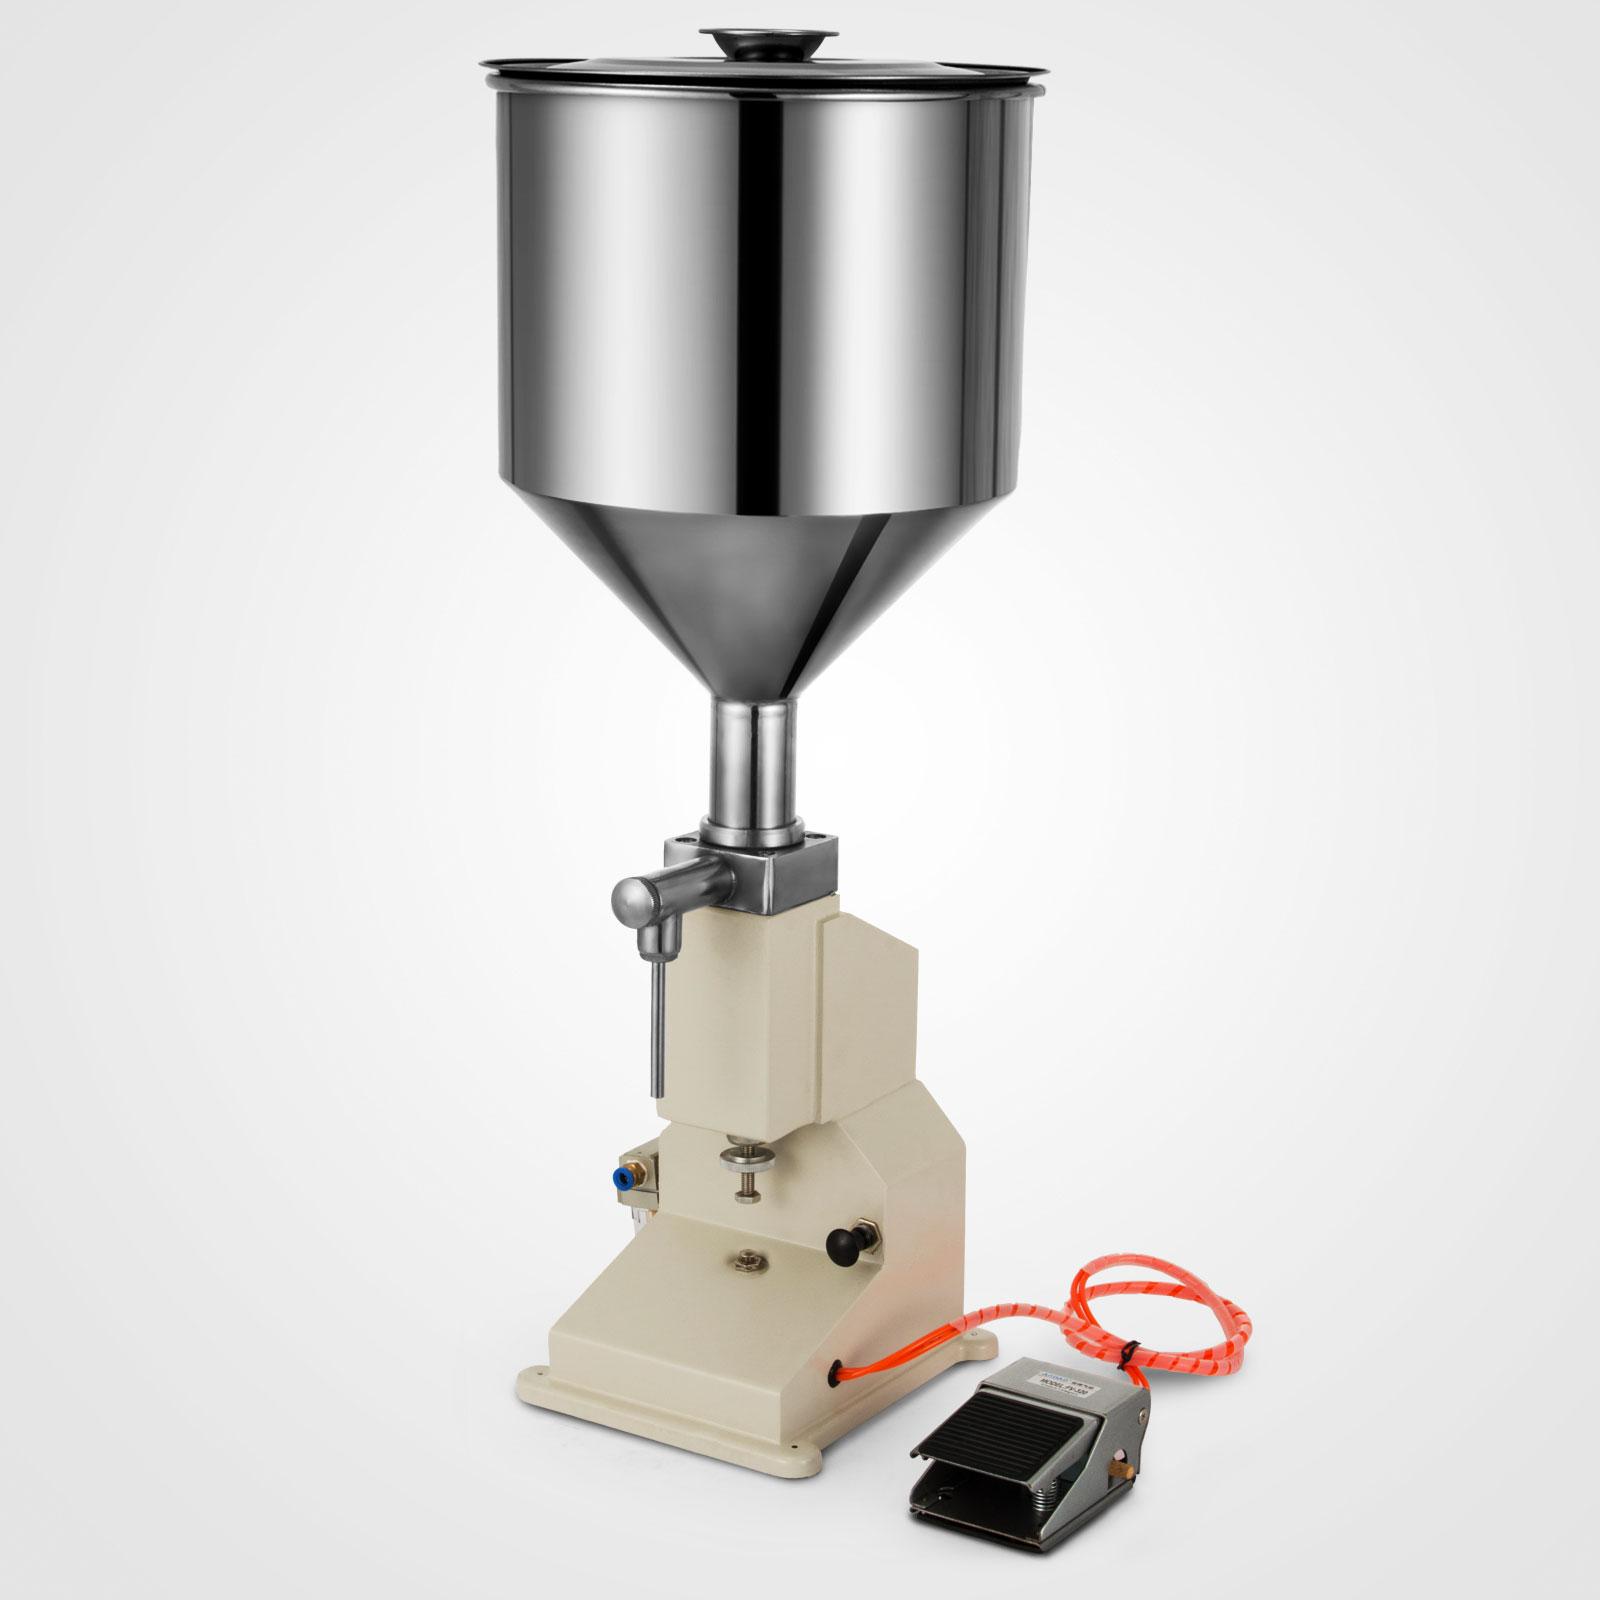 Liquid-Filling-Machine-Filler-Remplissage-2-3500ML-50-500ML-INDUSTRY-SUPPLY miniature 56